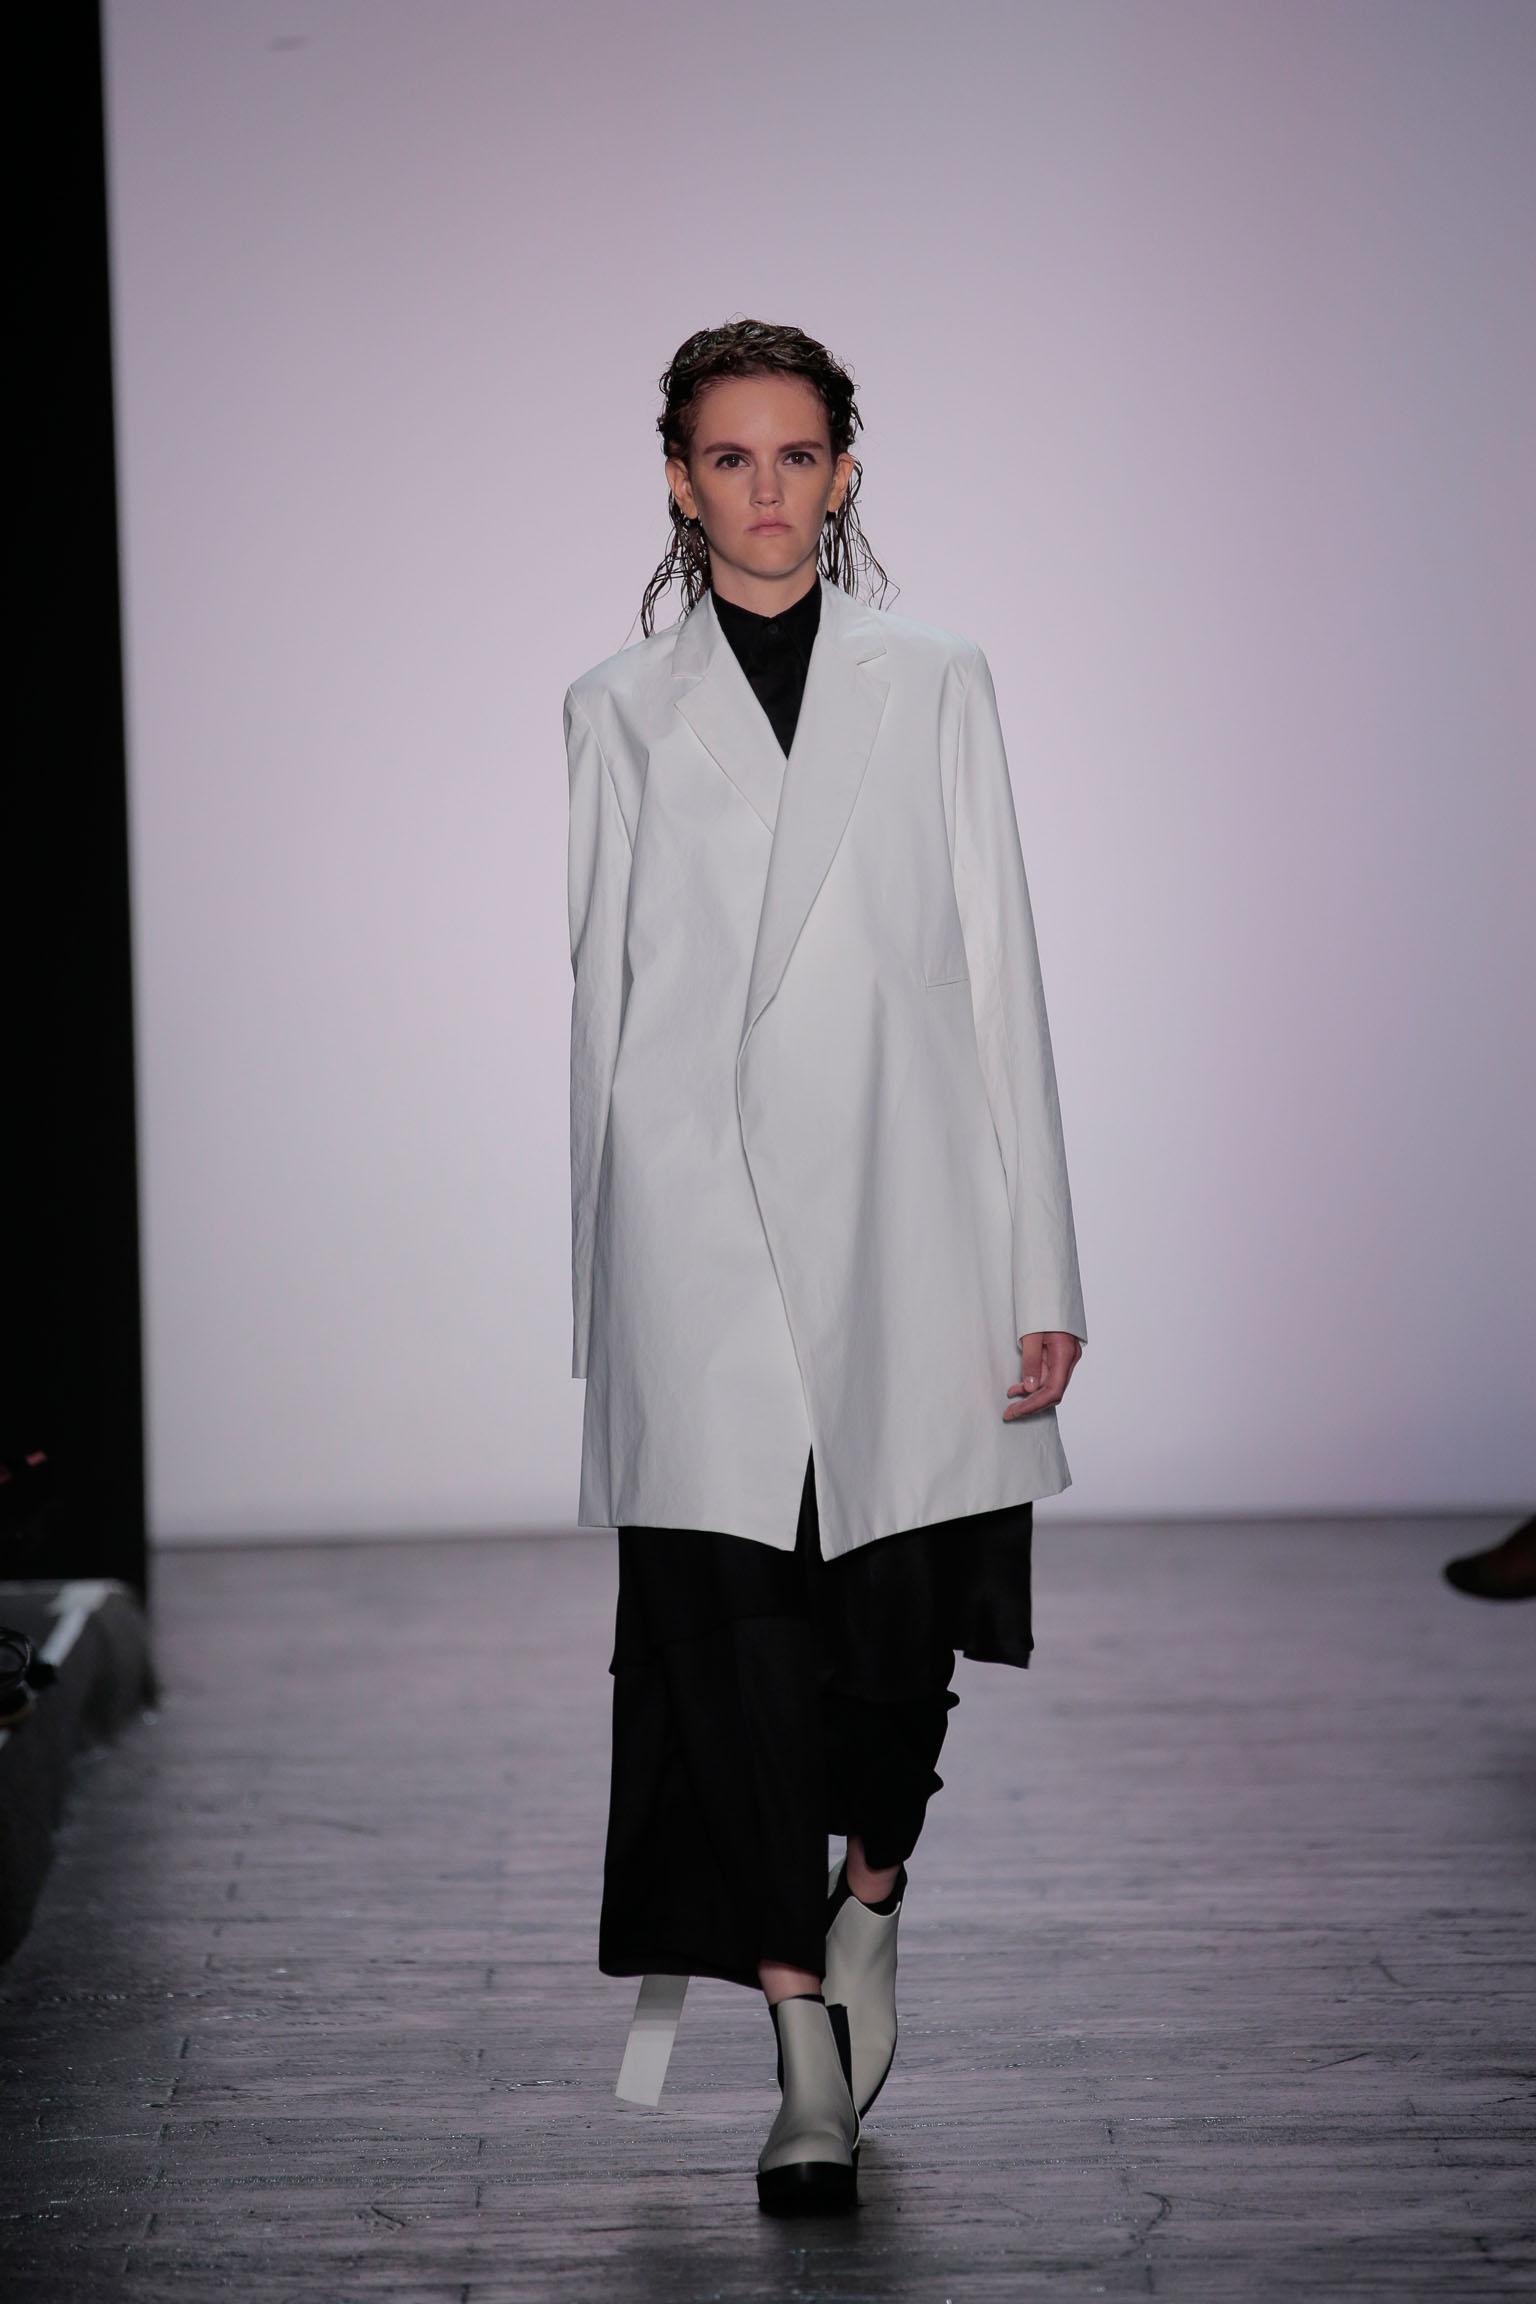 Fashion merchandising internships in new york city 80